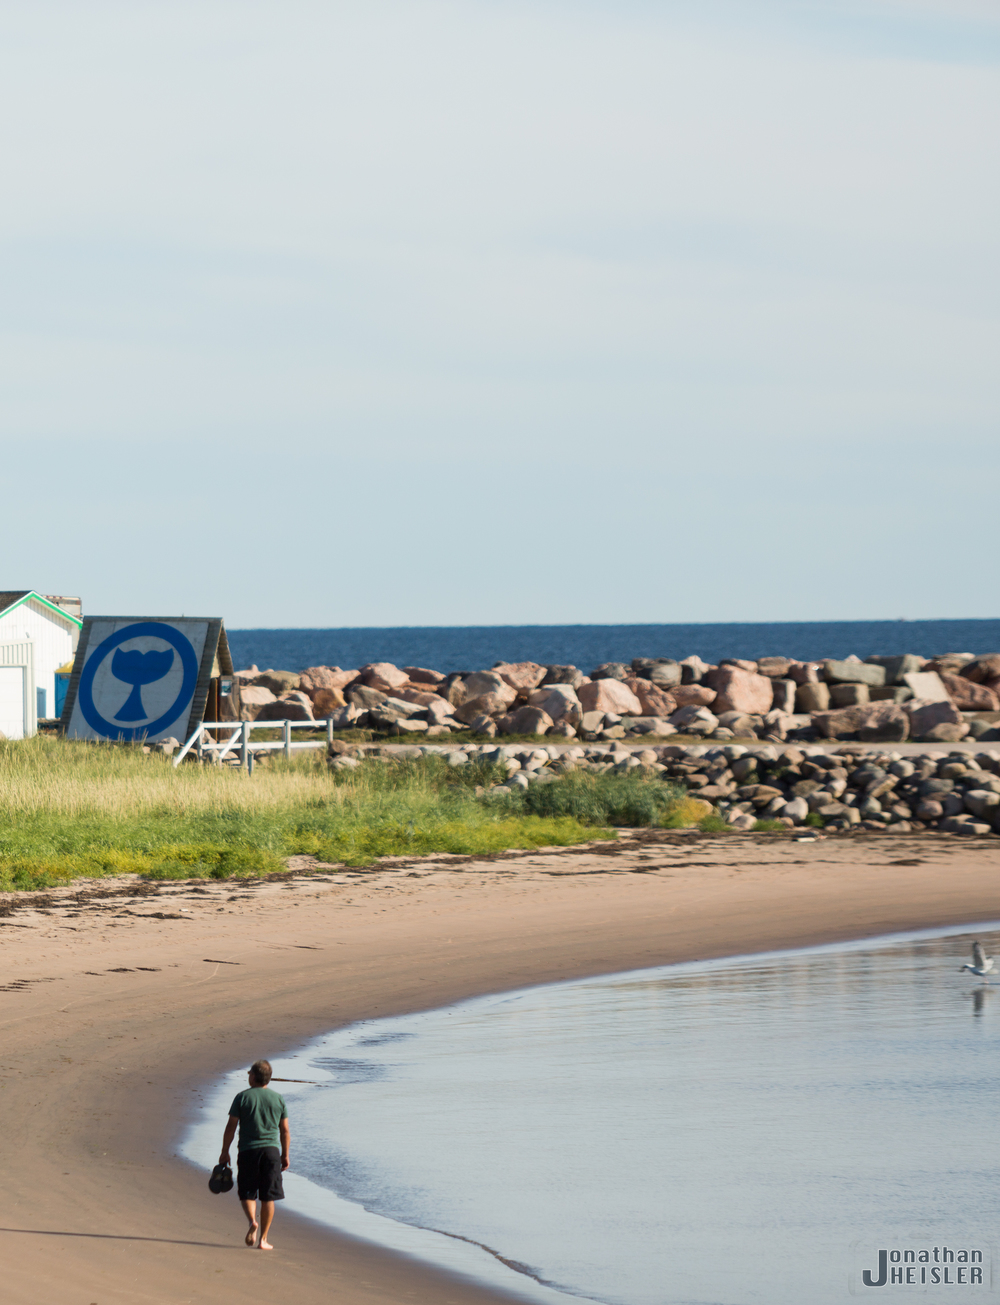 Nova Scotia  _  Jonathan Heisler _ 8.25.2013 _ 00070.jpg